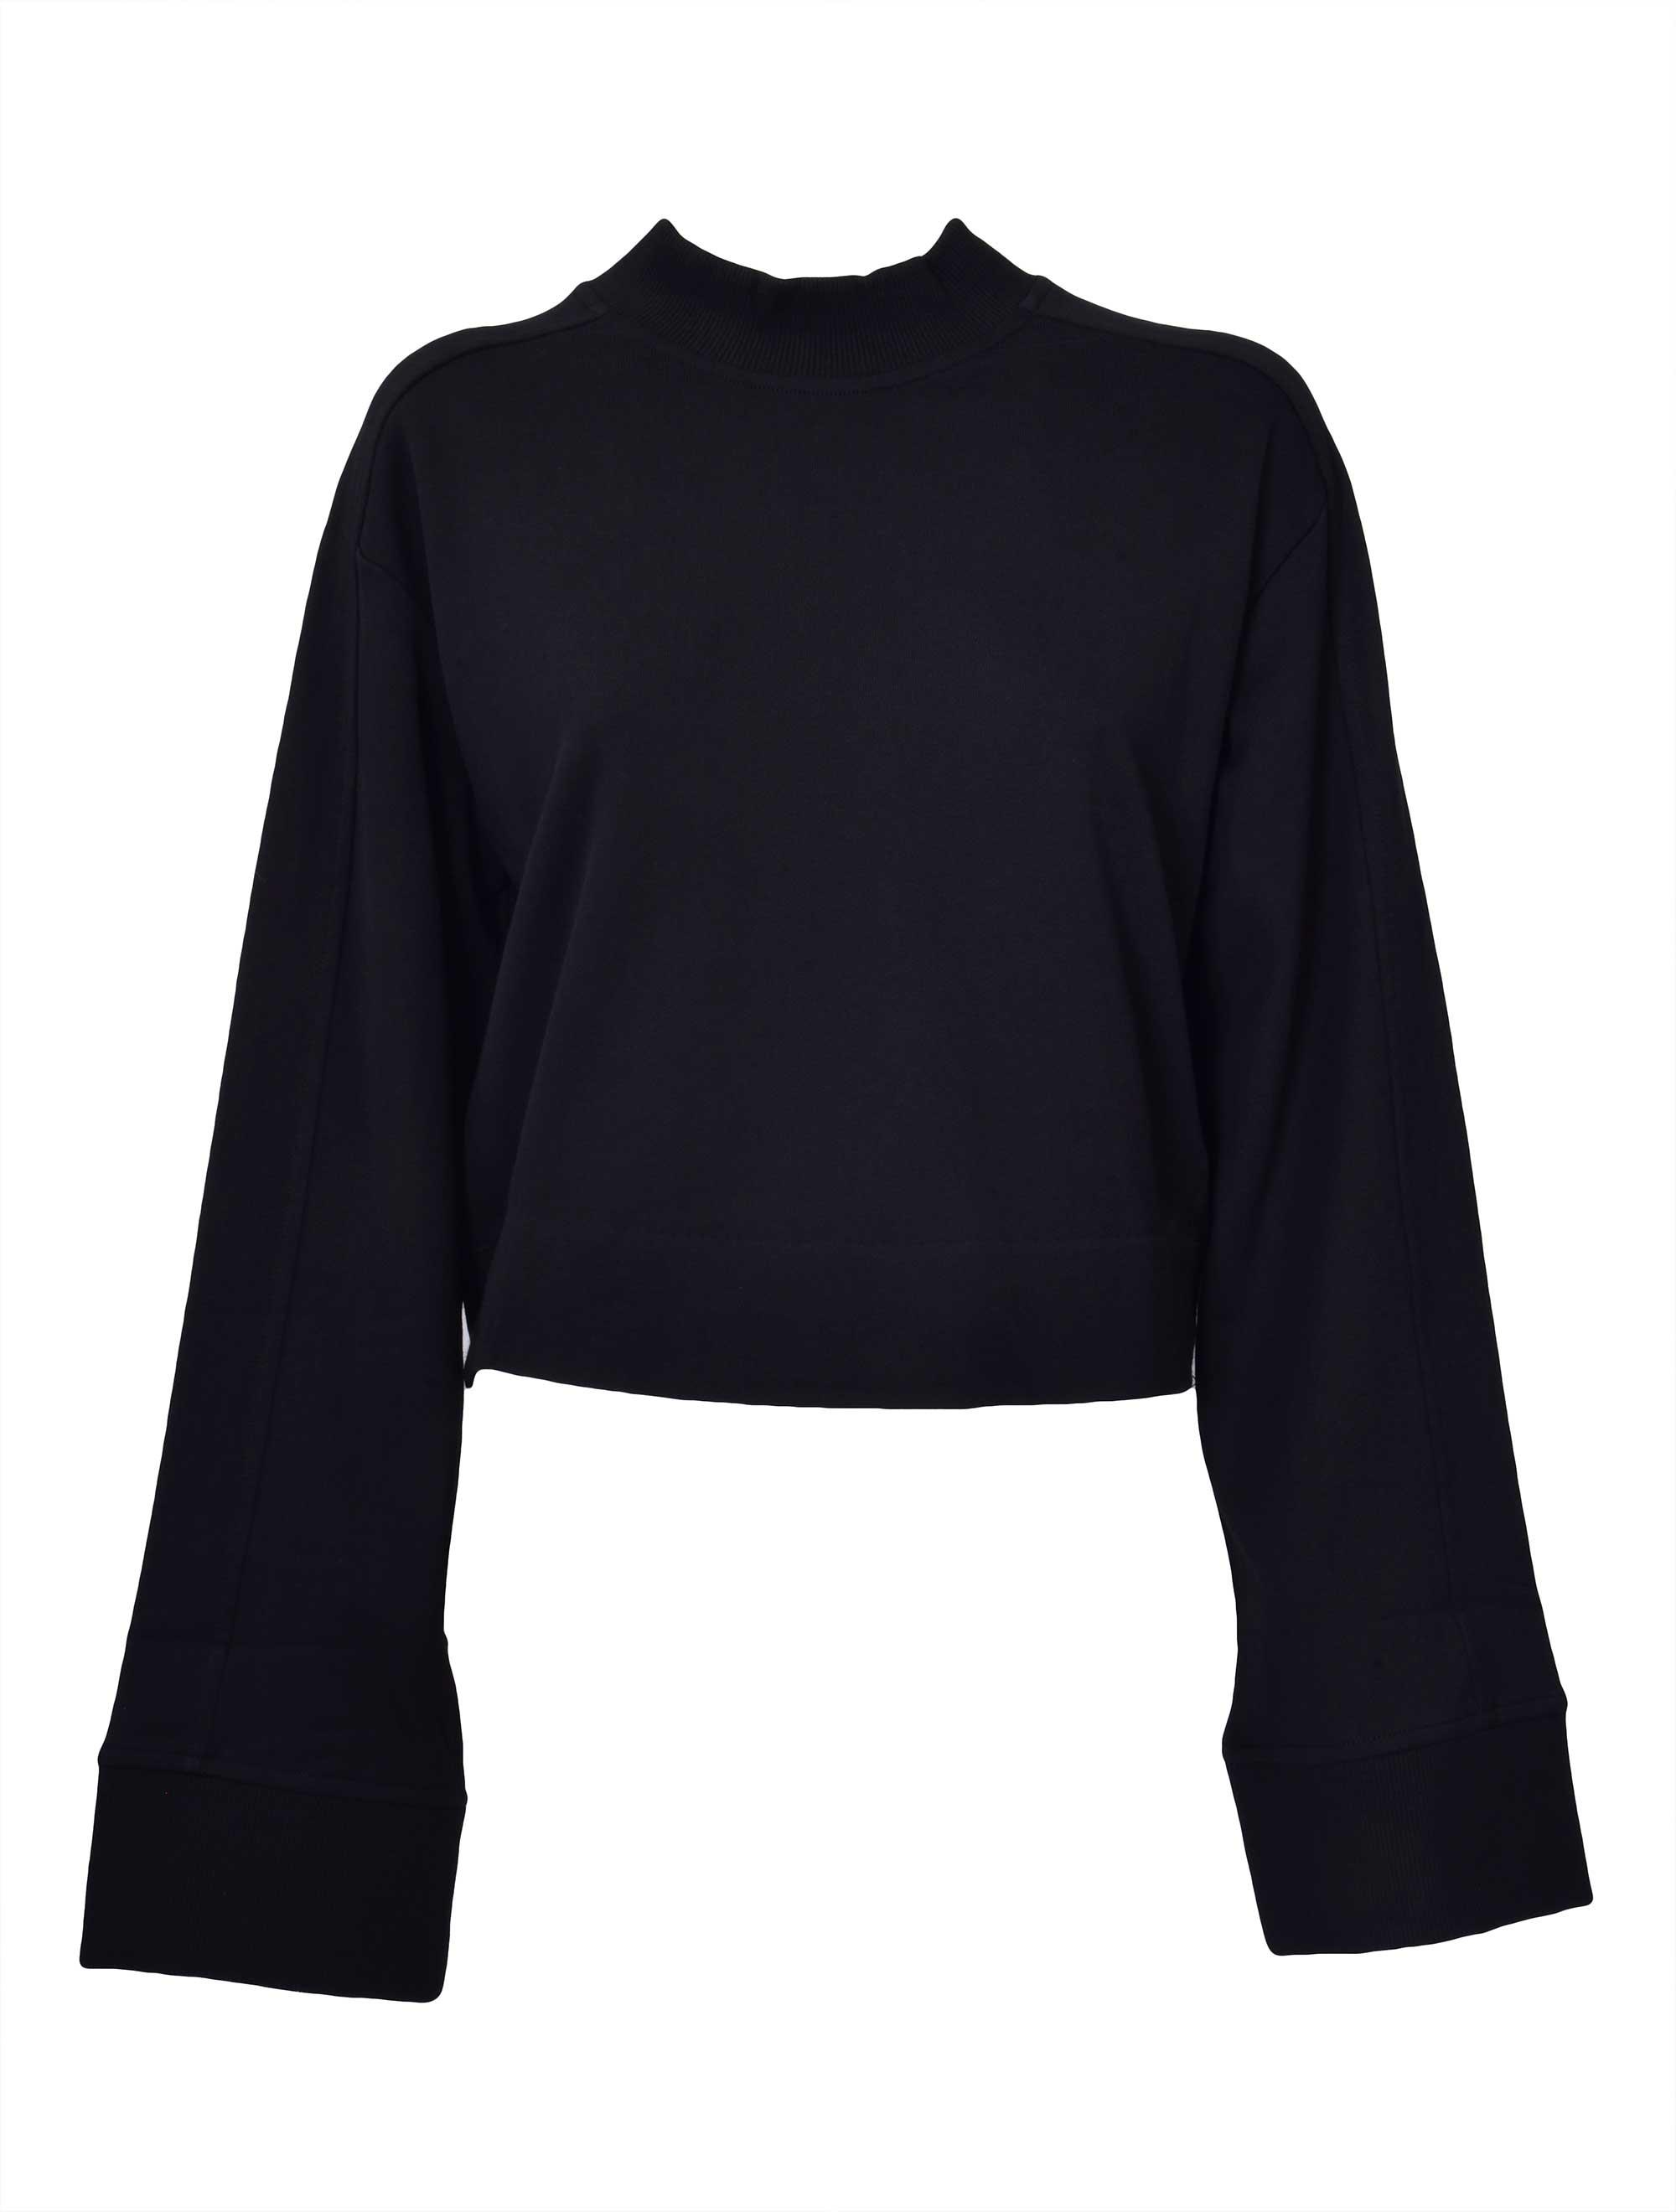 Mimma Ninni – Luxury and Fashion Shopping. Adidas Y-3 Cropped ... 4338fb71c0e4